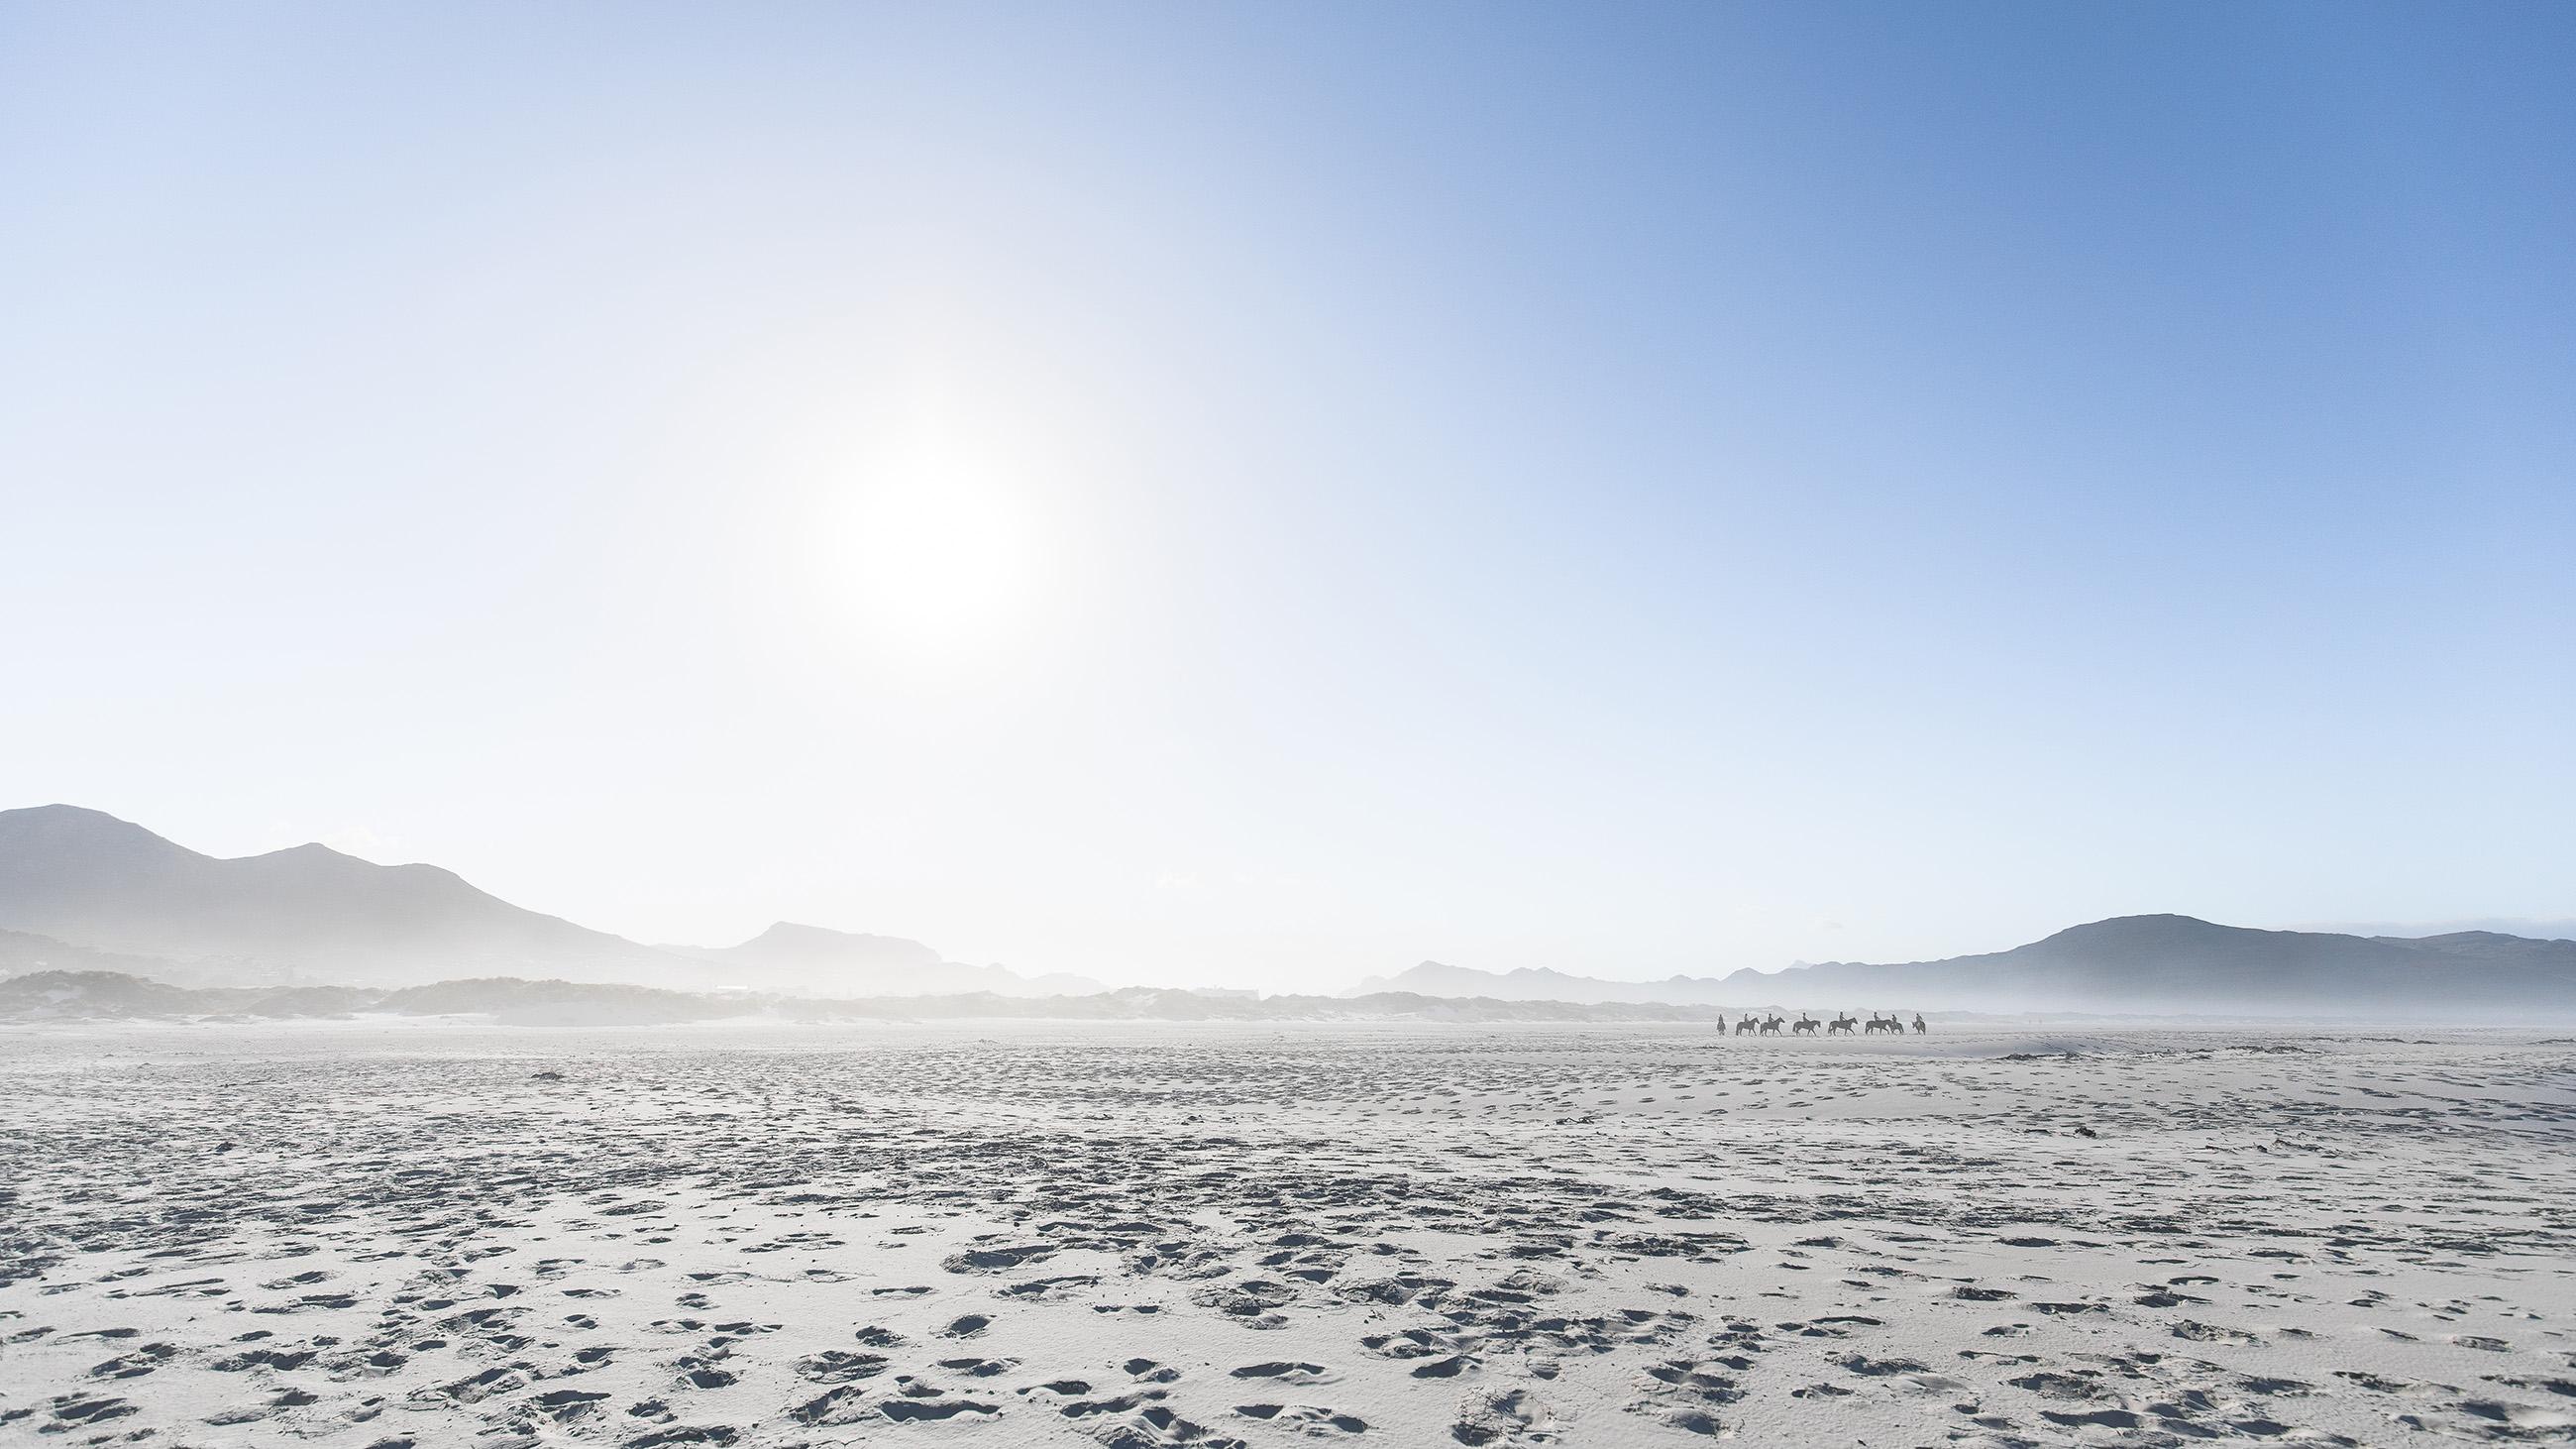 noordhoek-southafrica-beach-bay-horses-sand-mountains-chapmanpeak-capetown